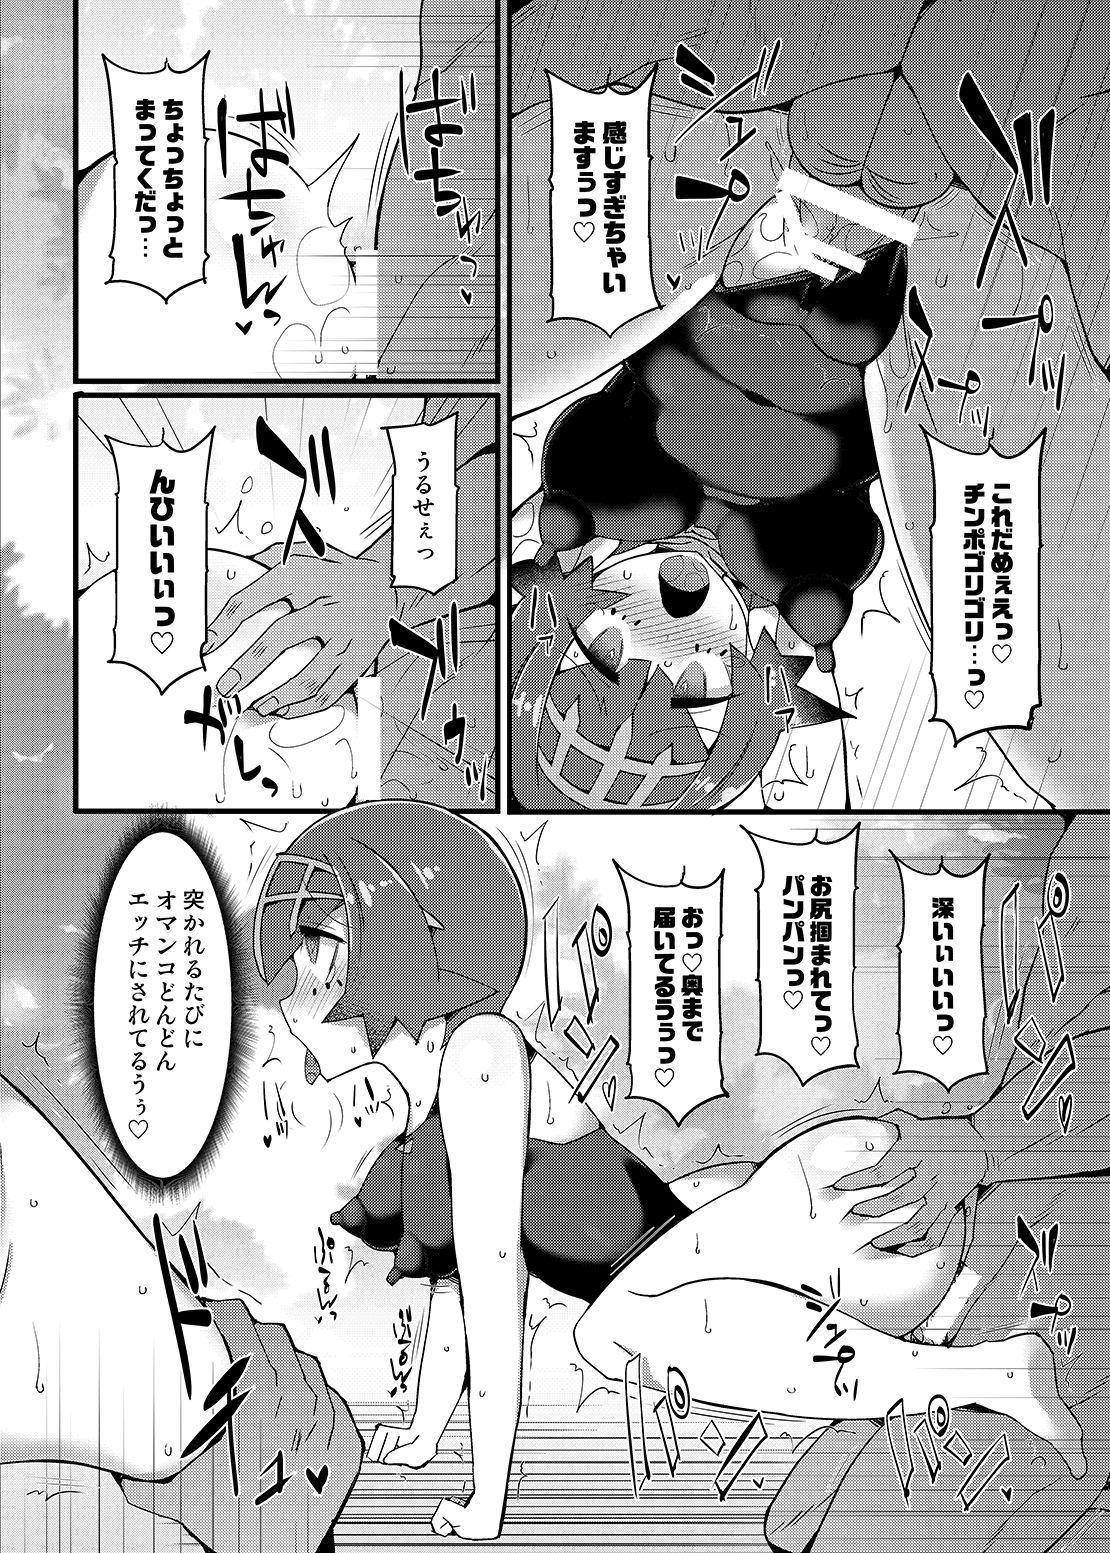 [Stapspats (Hisui)] Stapspats [Pocket Monster Saimin Series Soushuuhen] 1 Collective Hypnosis (Pokémon) [Digital] 106